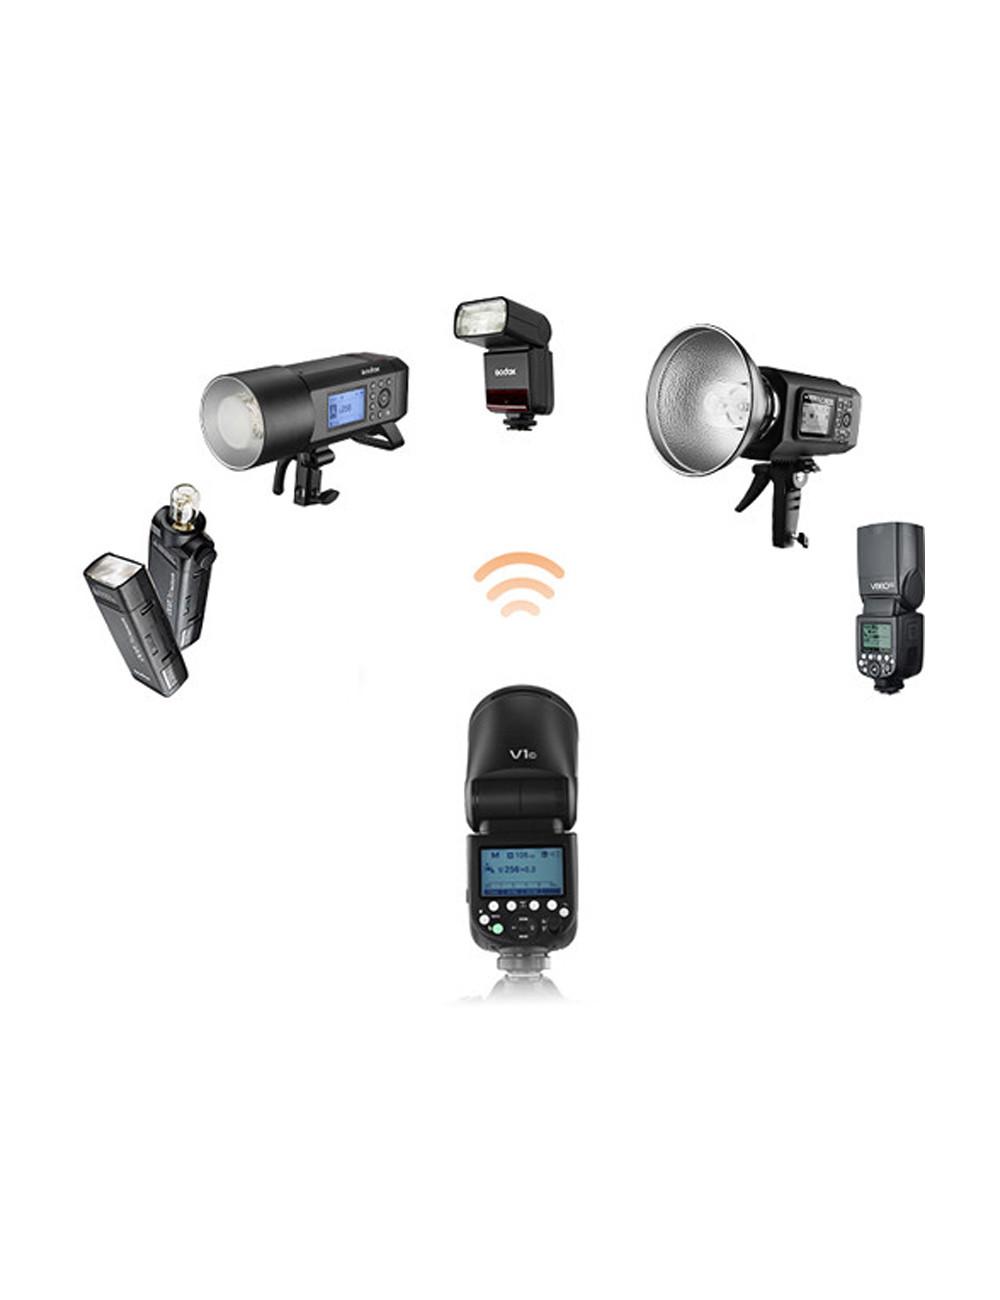 Lente Tamron SP 35mm F/1.8 Di VC USD con parasol para Nikon